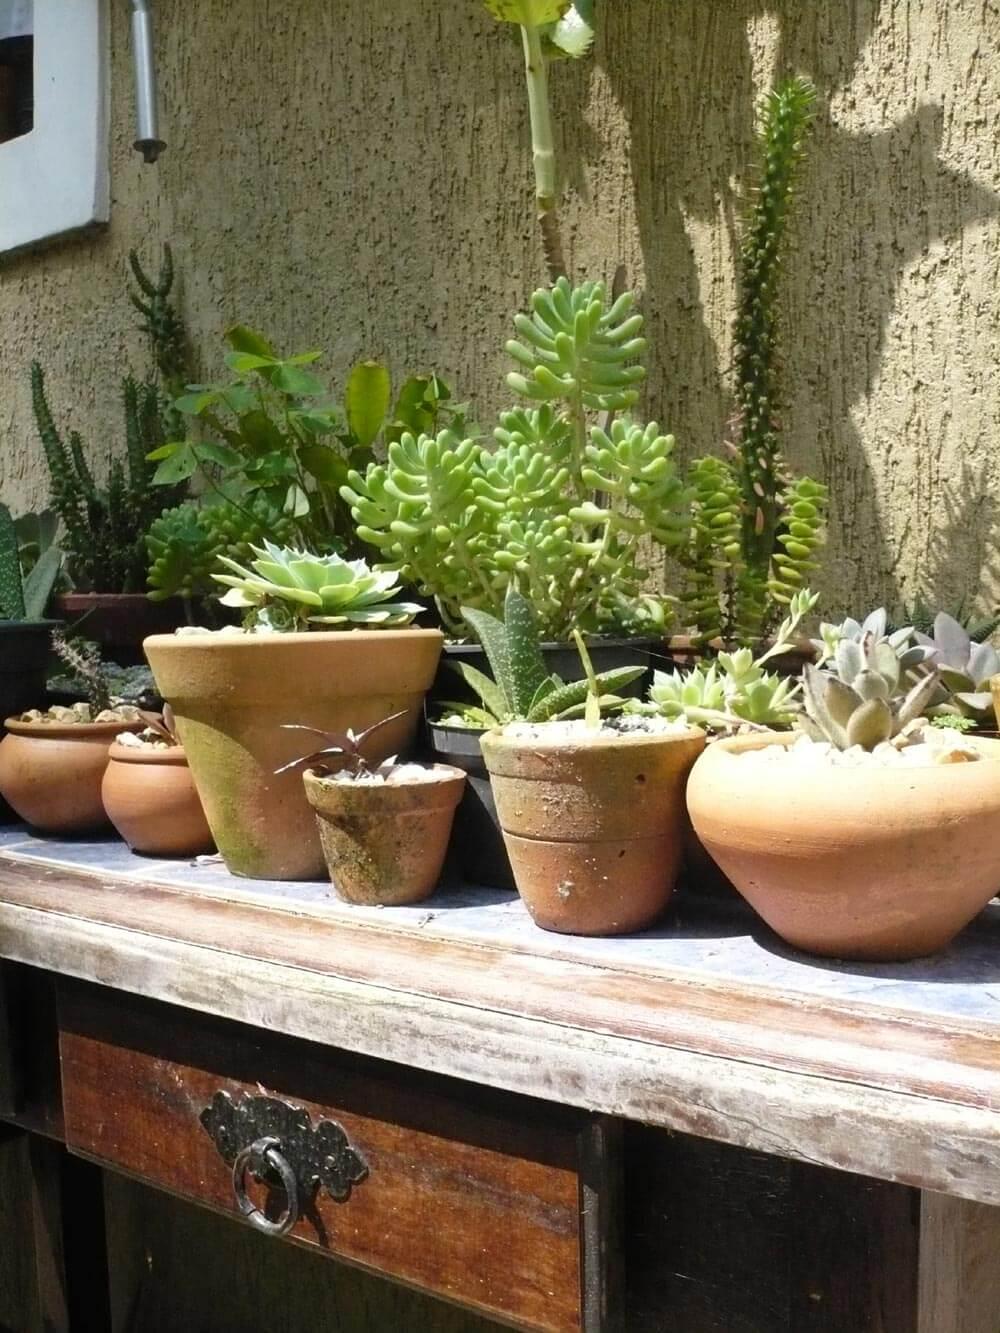 bancada com vasos de plantas